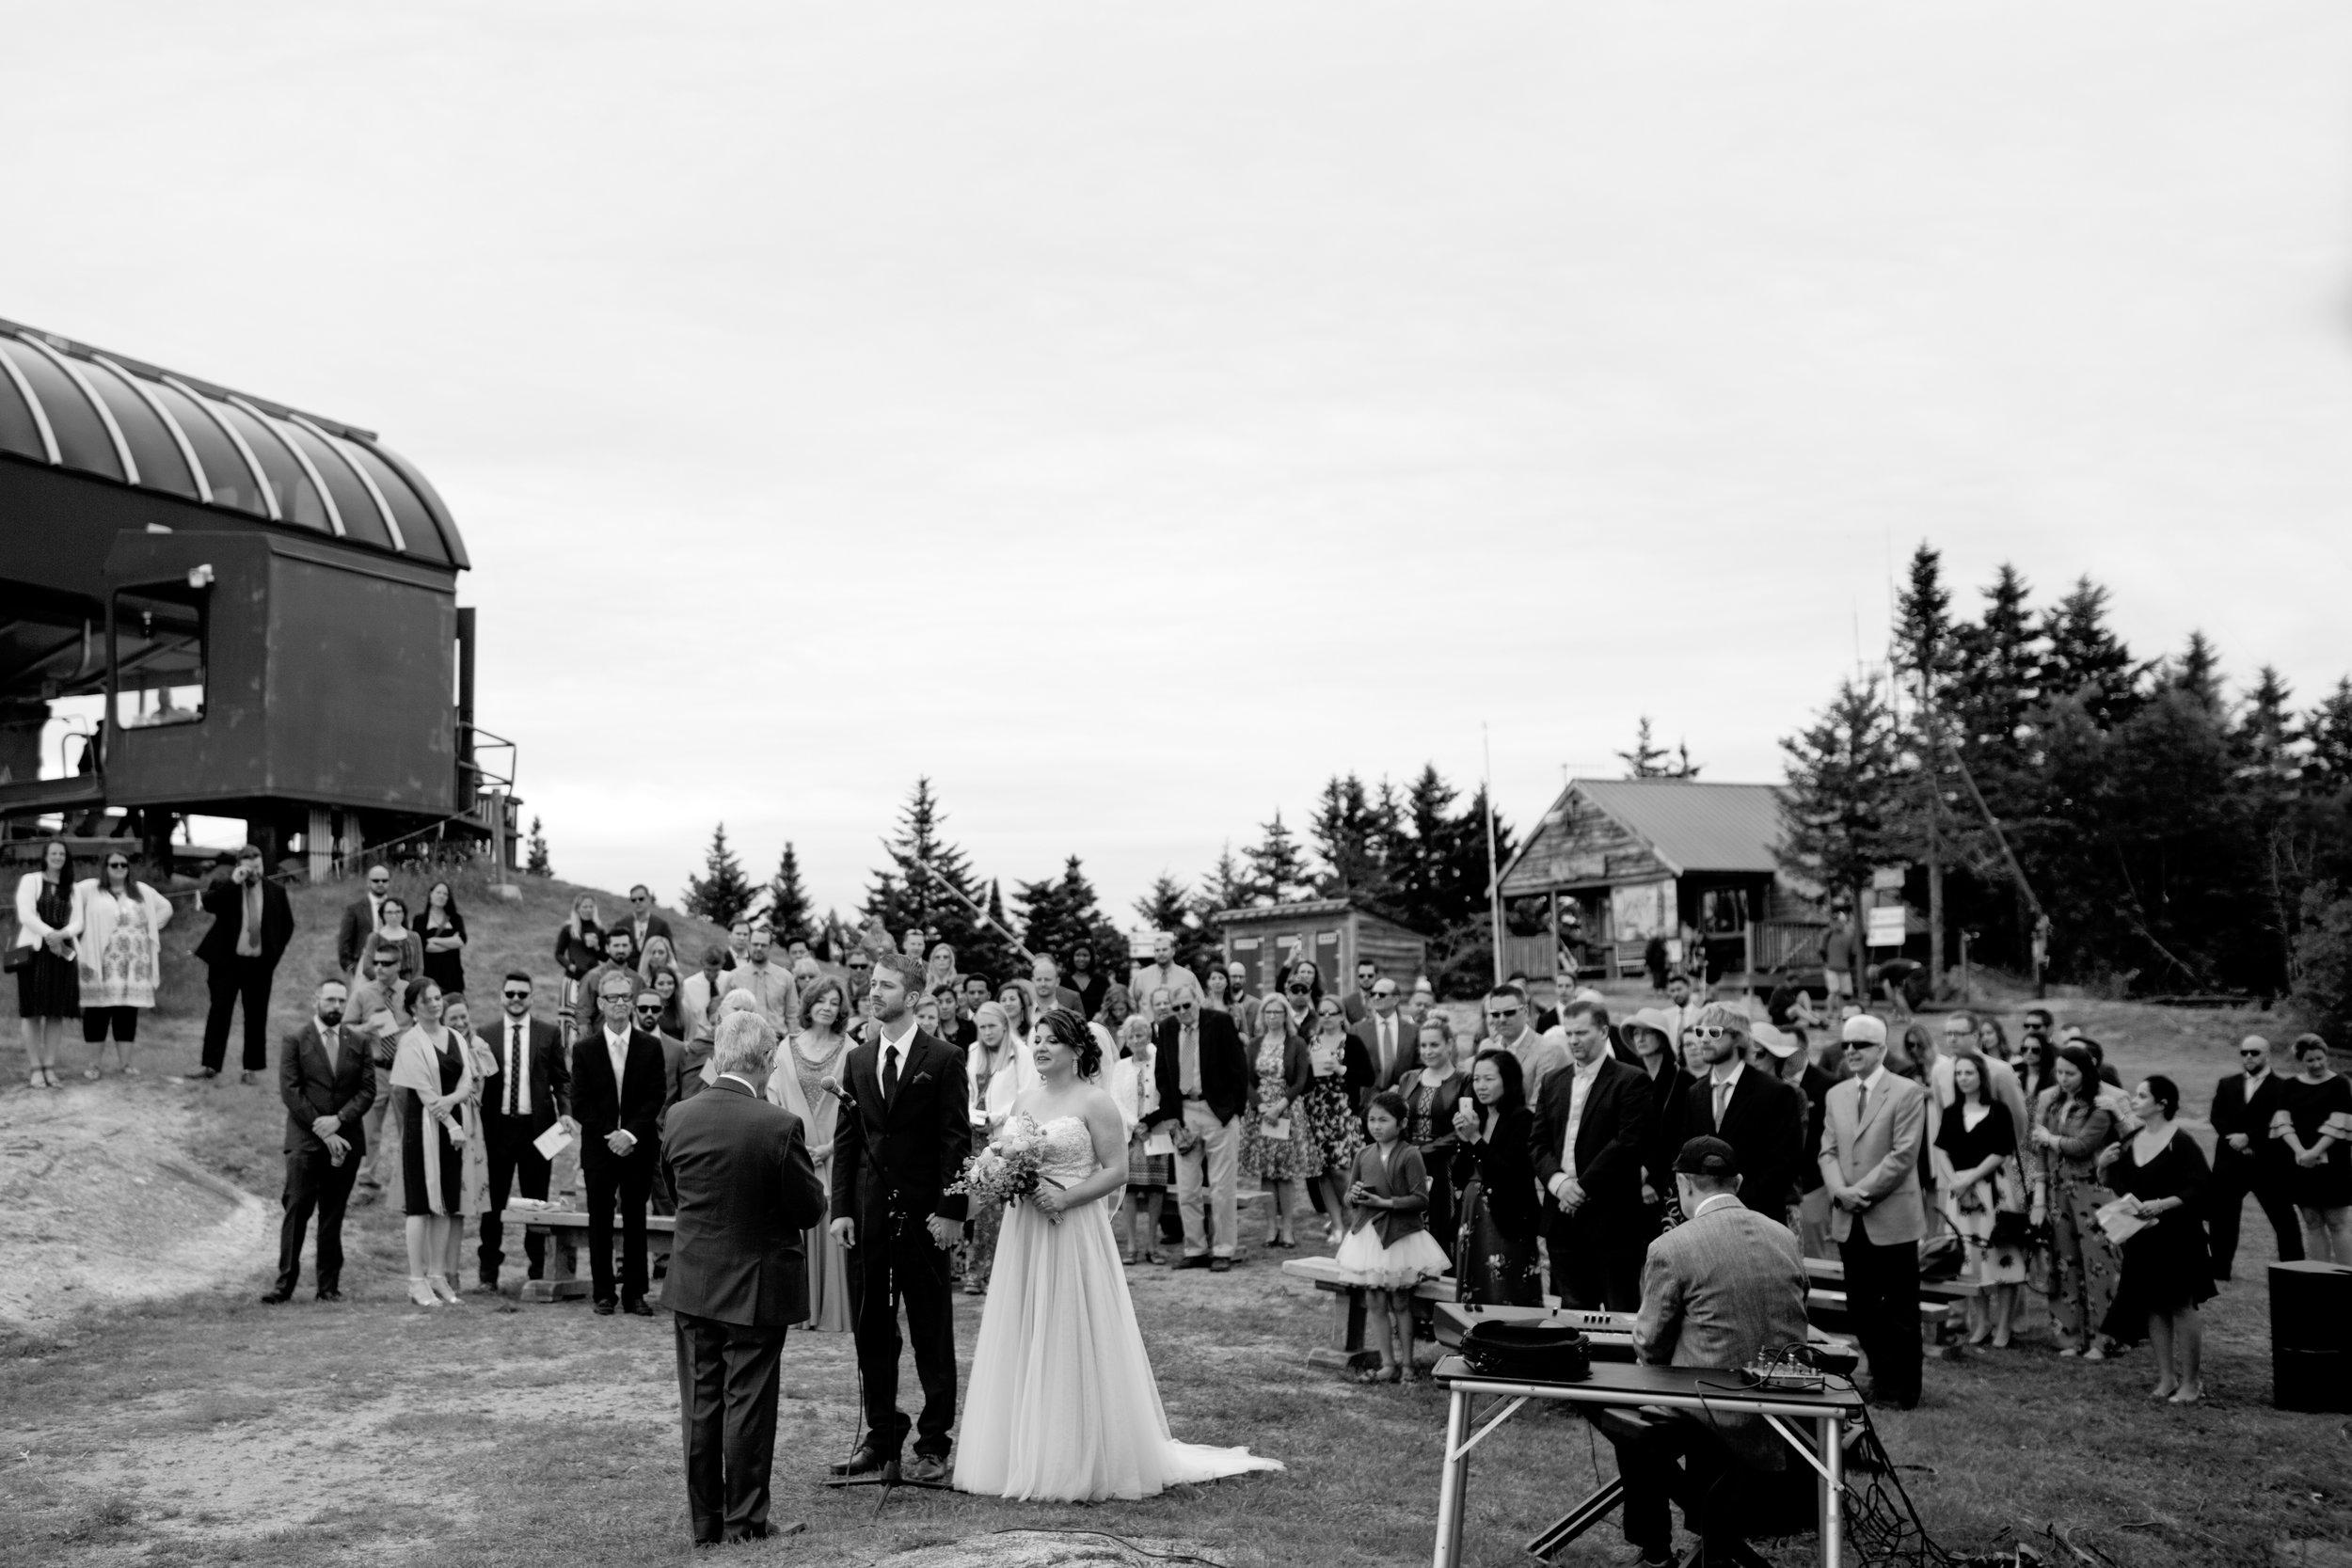 gunstock-mountain-resort-wedding-photos-12.JPG